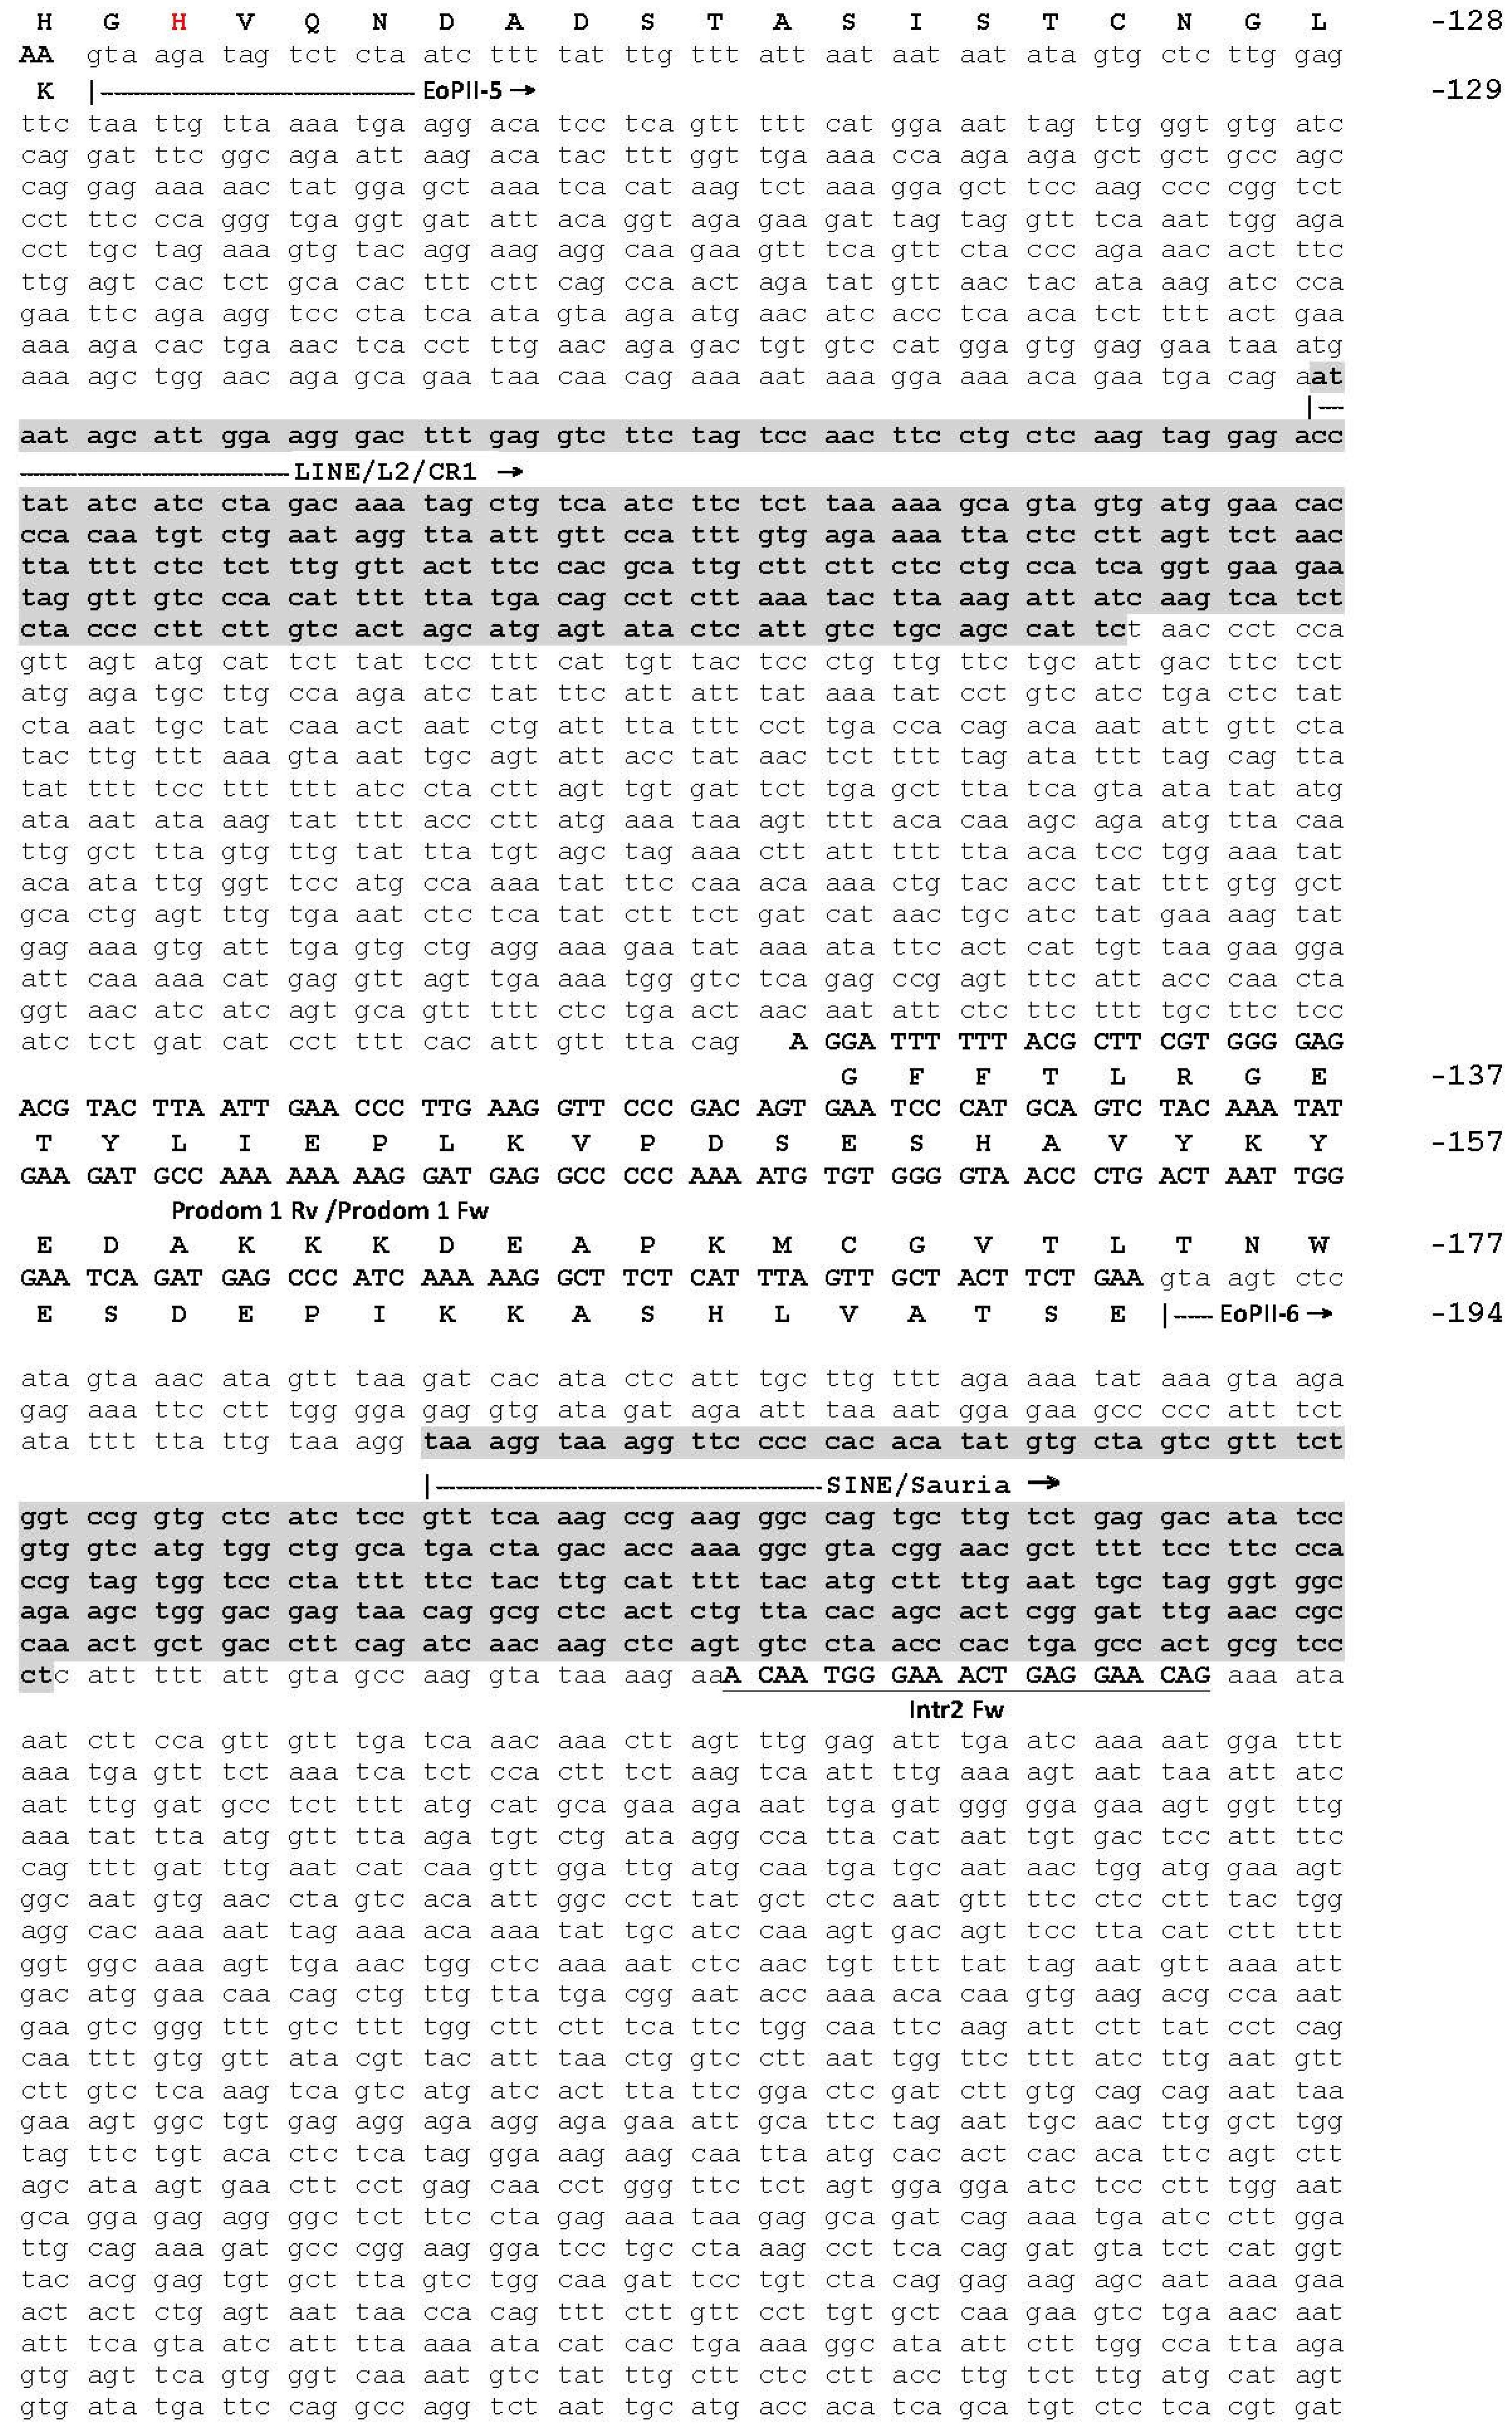 complimentary strand to cgt ctc ttc gga cac Name that gene  objective: in this ccg cgg ccc gga gtc ctc ctg ctc ctg ctg tcc atc ctc cac ttg aat agt atc aga ttc caa atc t gene sequence 5 atg cgt cga.